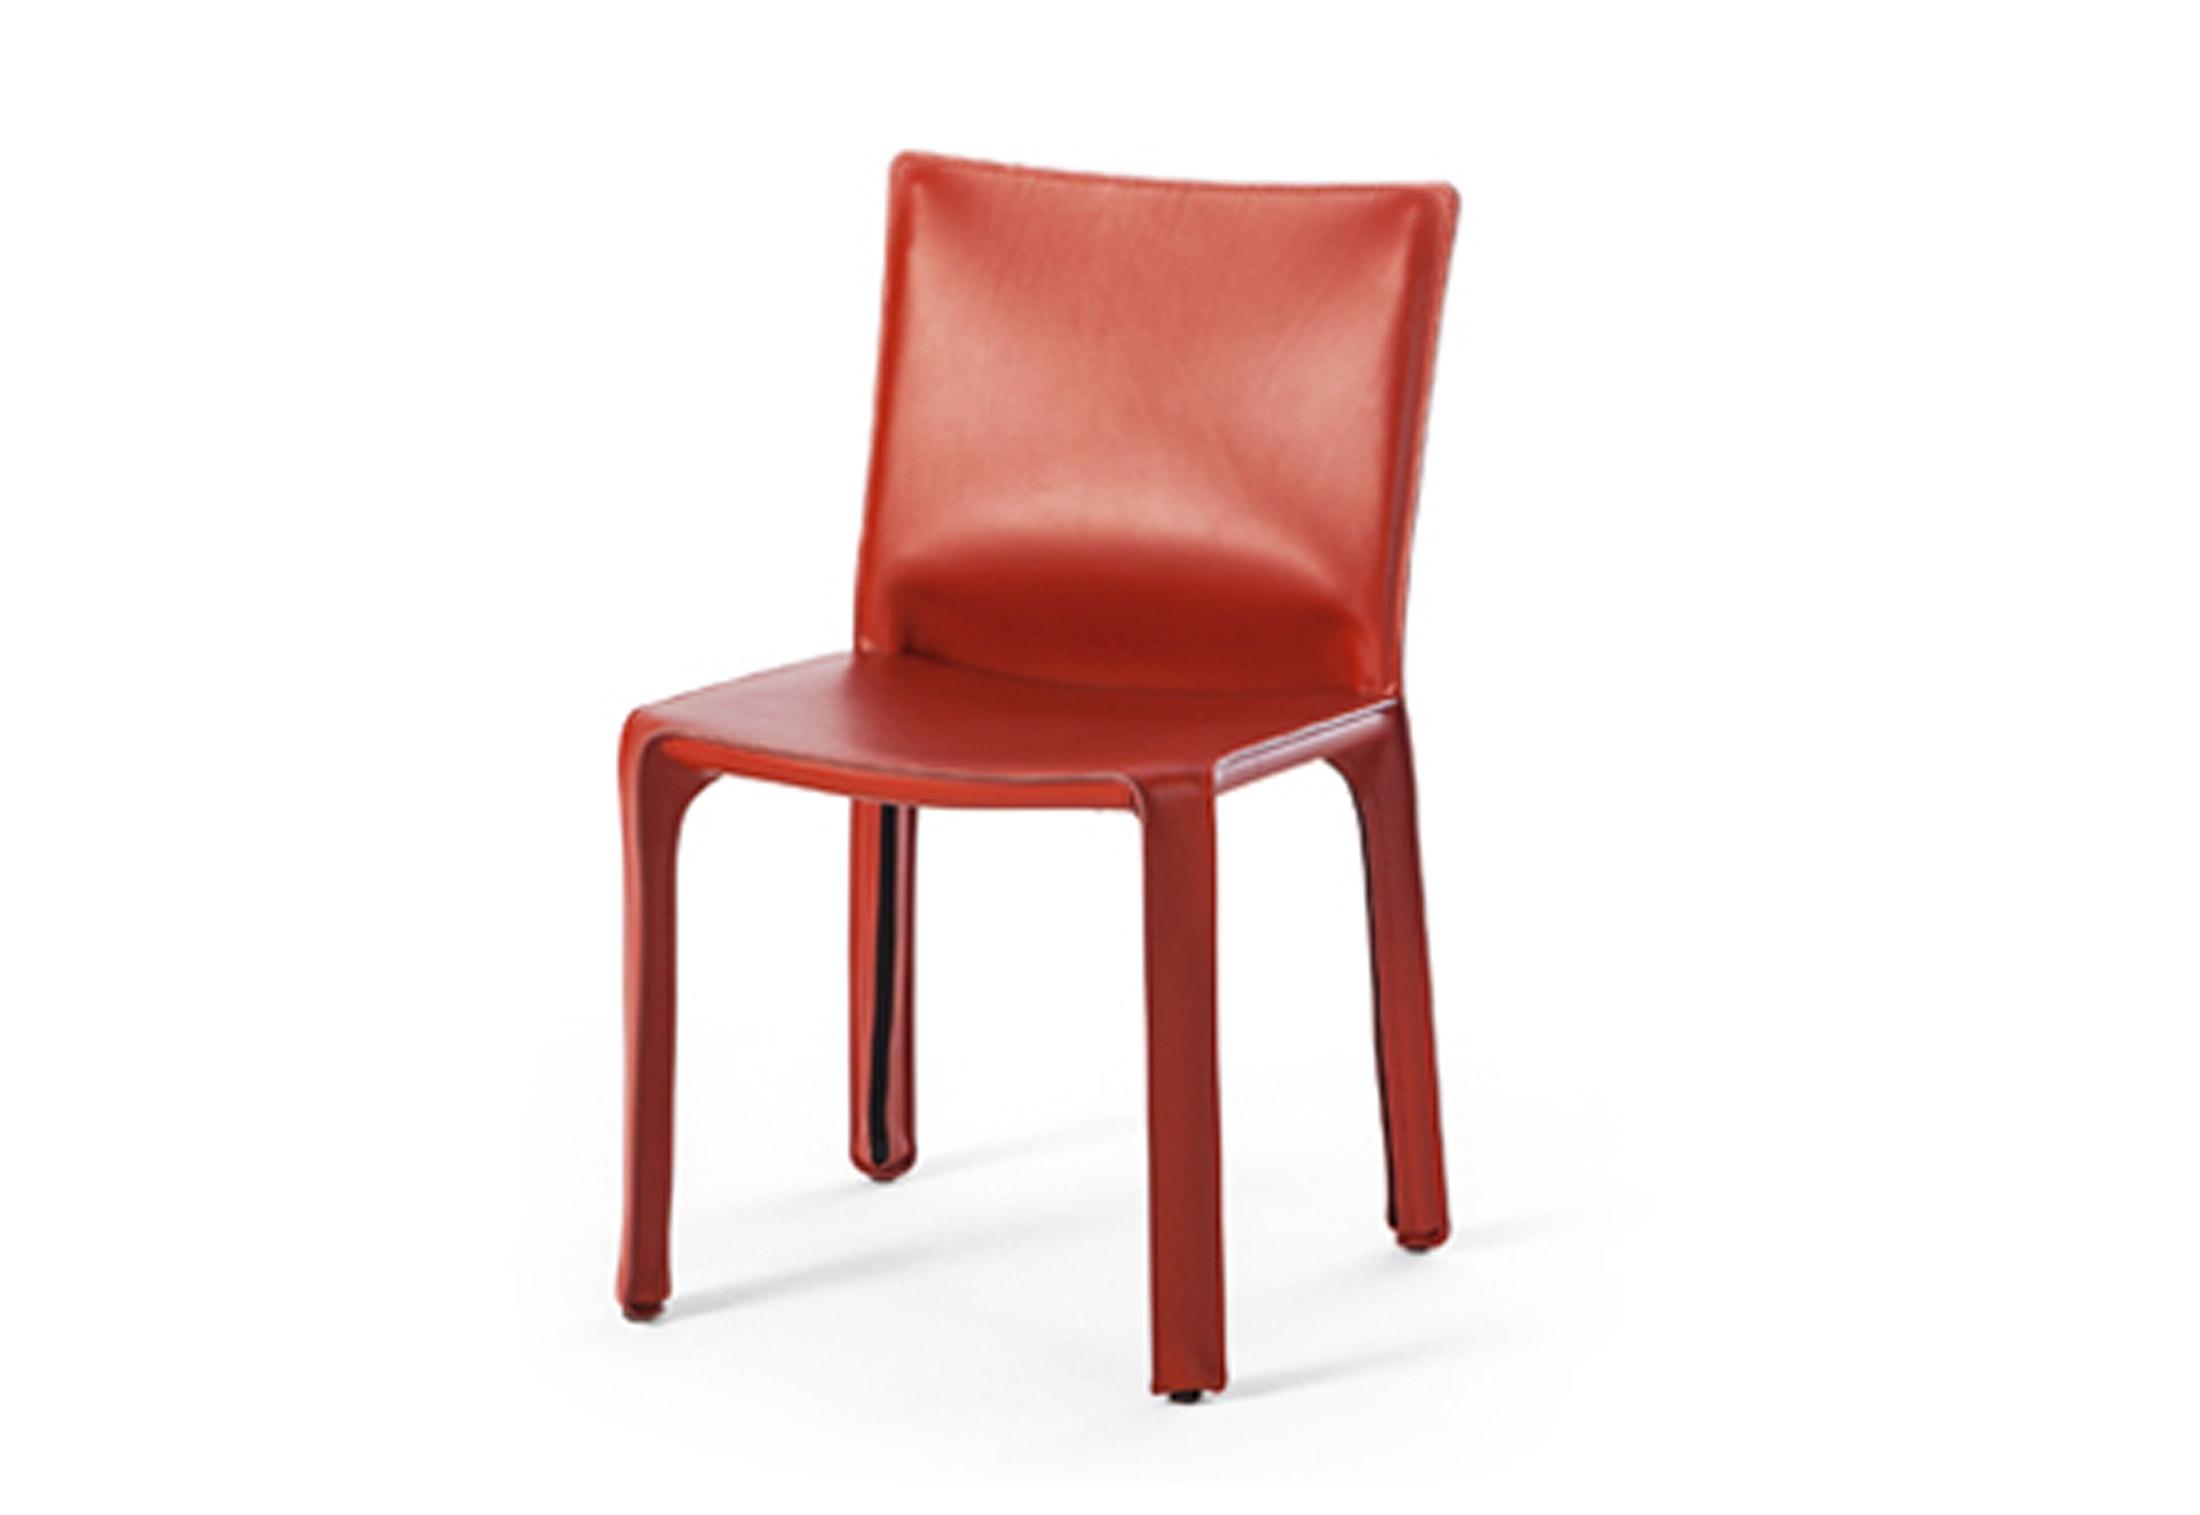 cab 412 stuhl von cassina stylepark. Black Bedroom Furniture Sets. Home Design Ideas